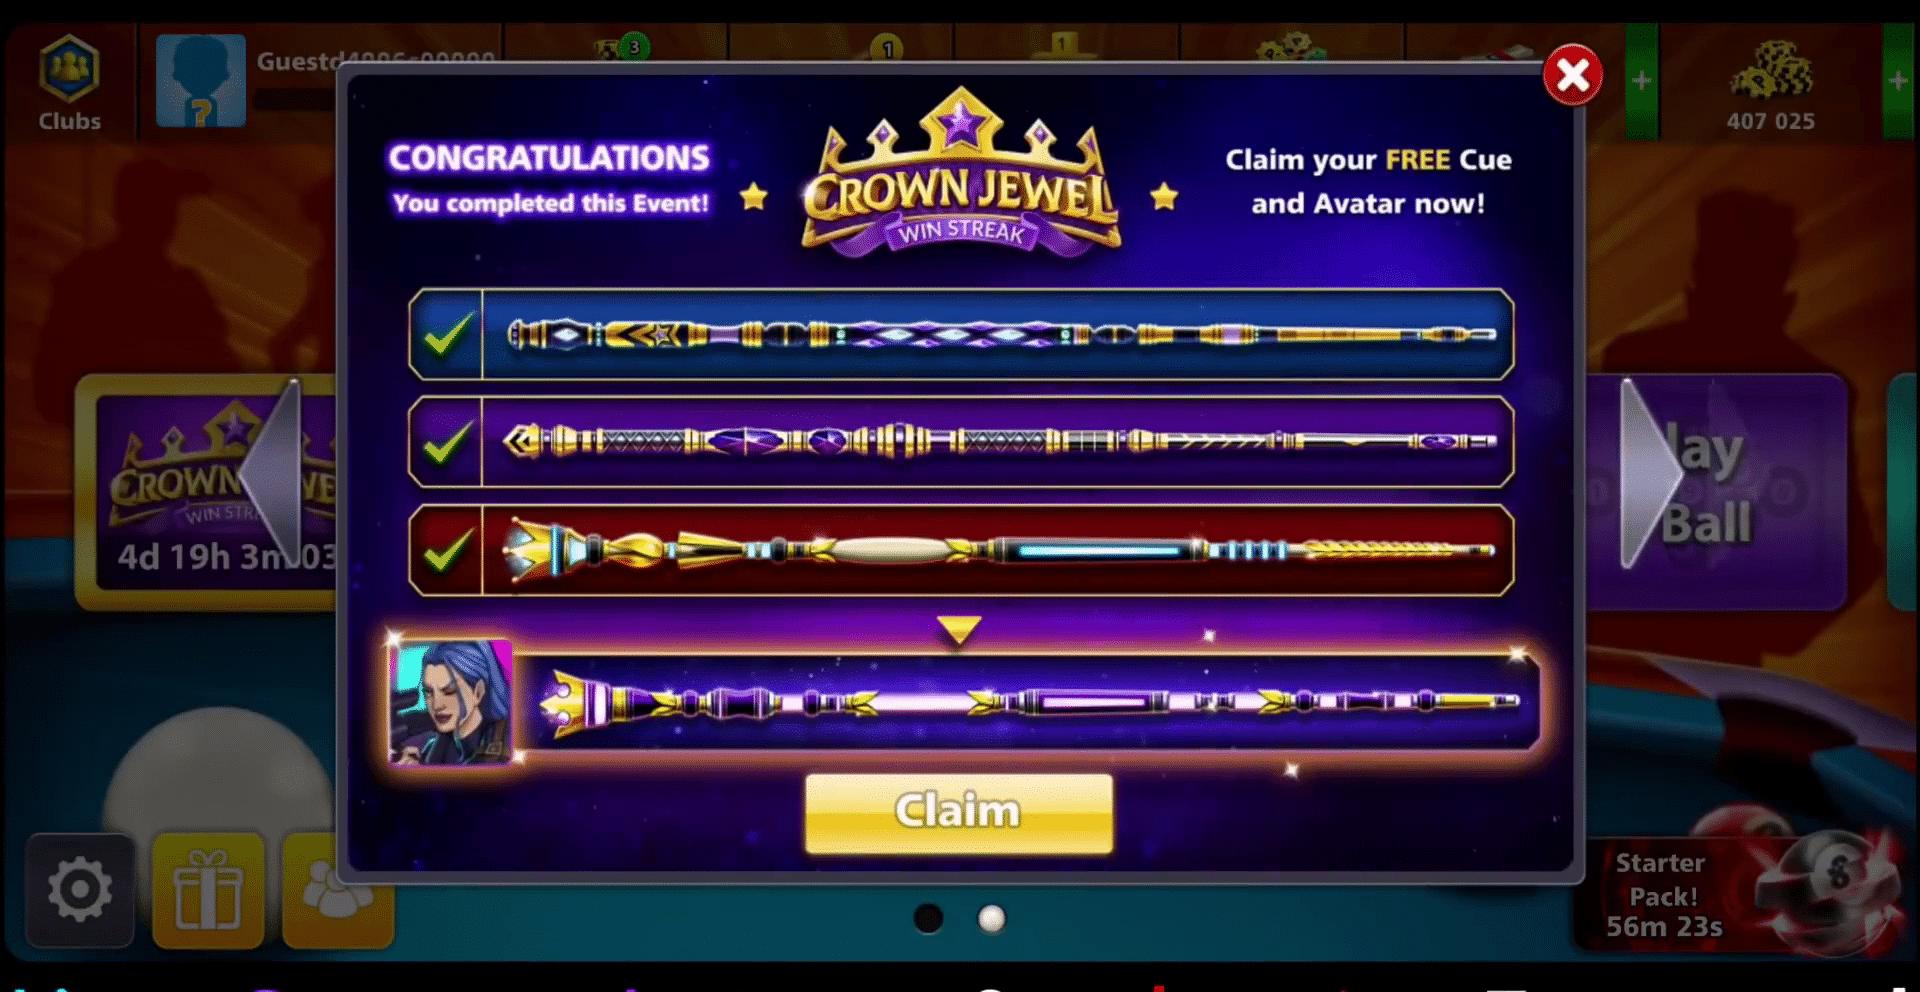 royal jewel cue